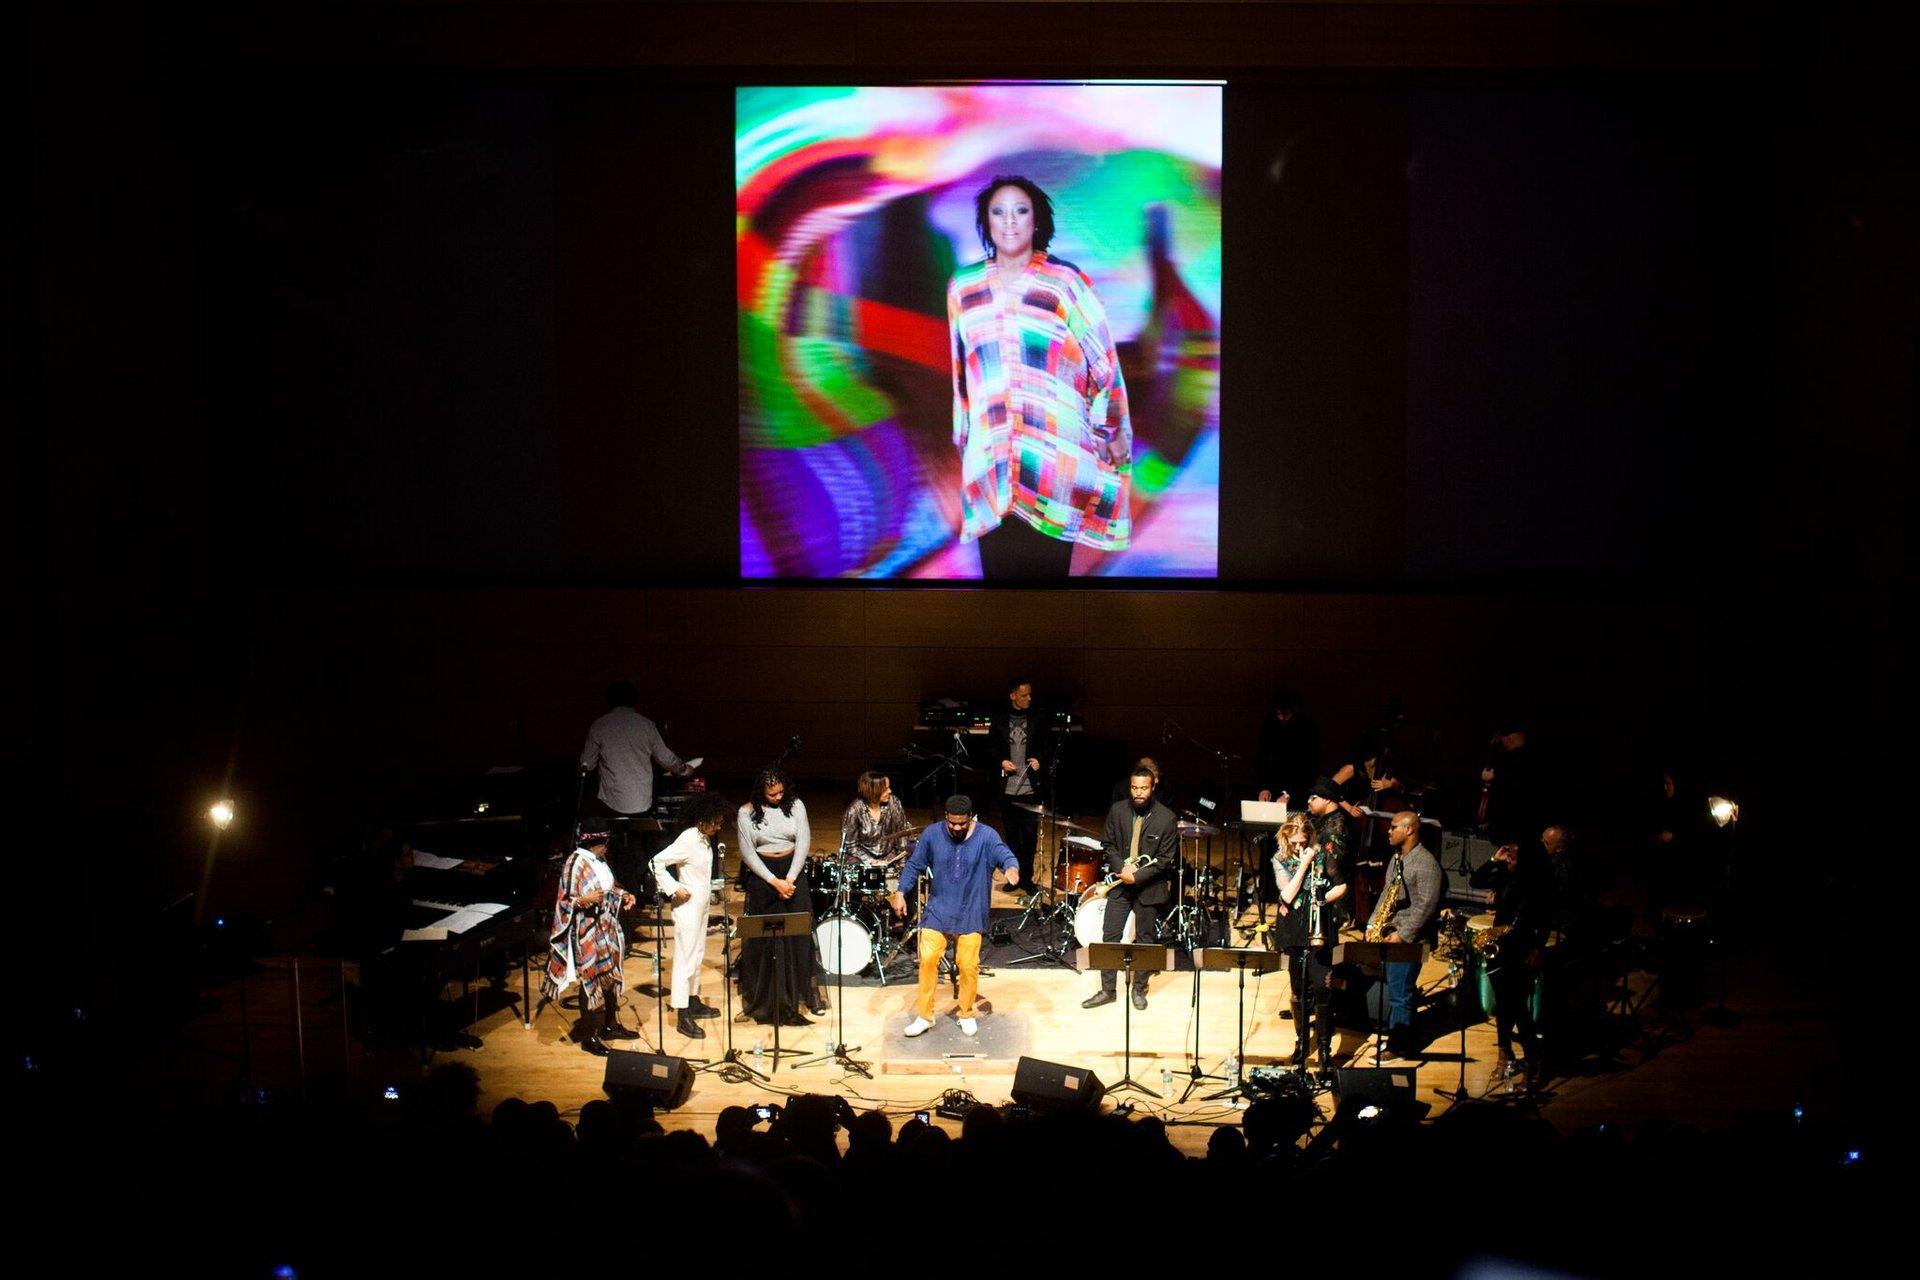 Winter Jazzfest in New York - Best Season 2020